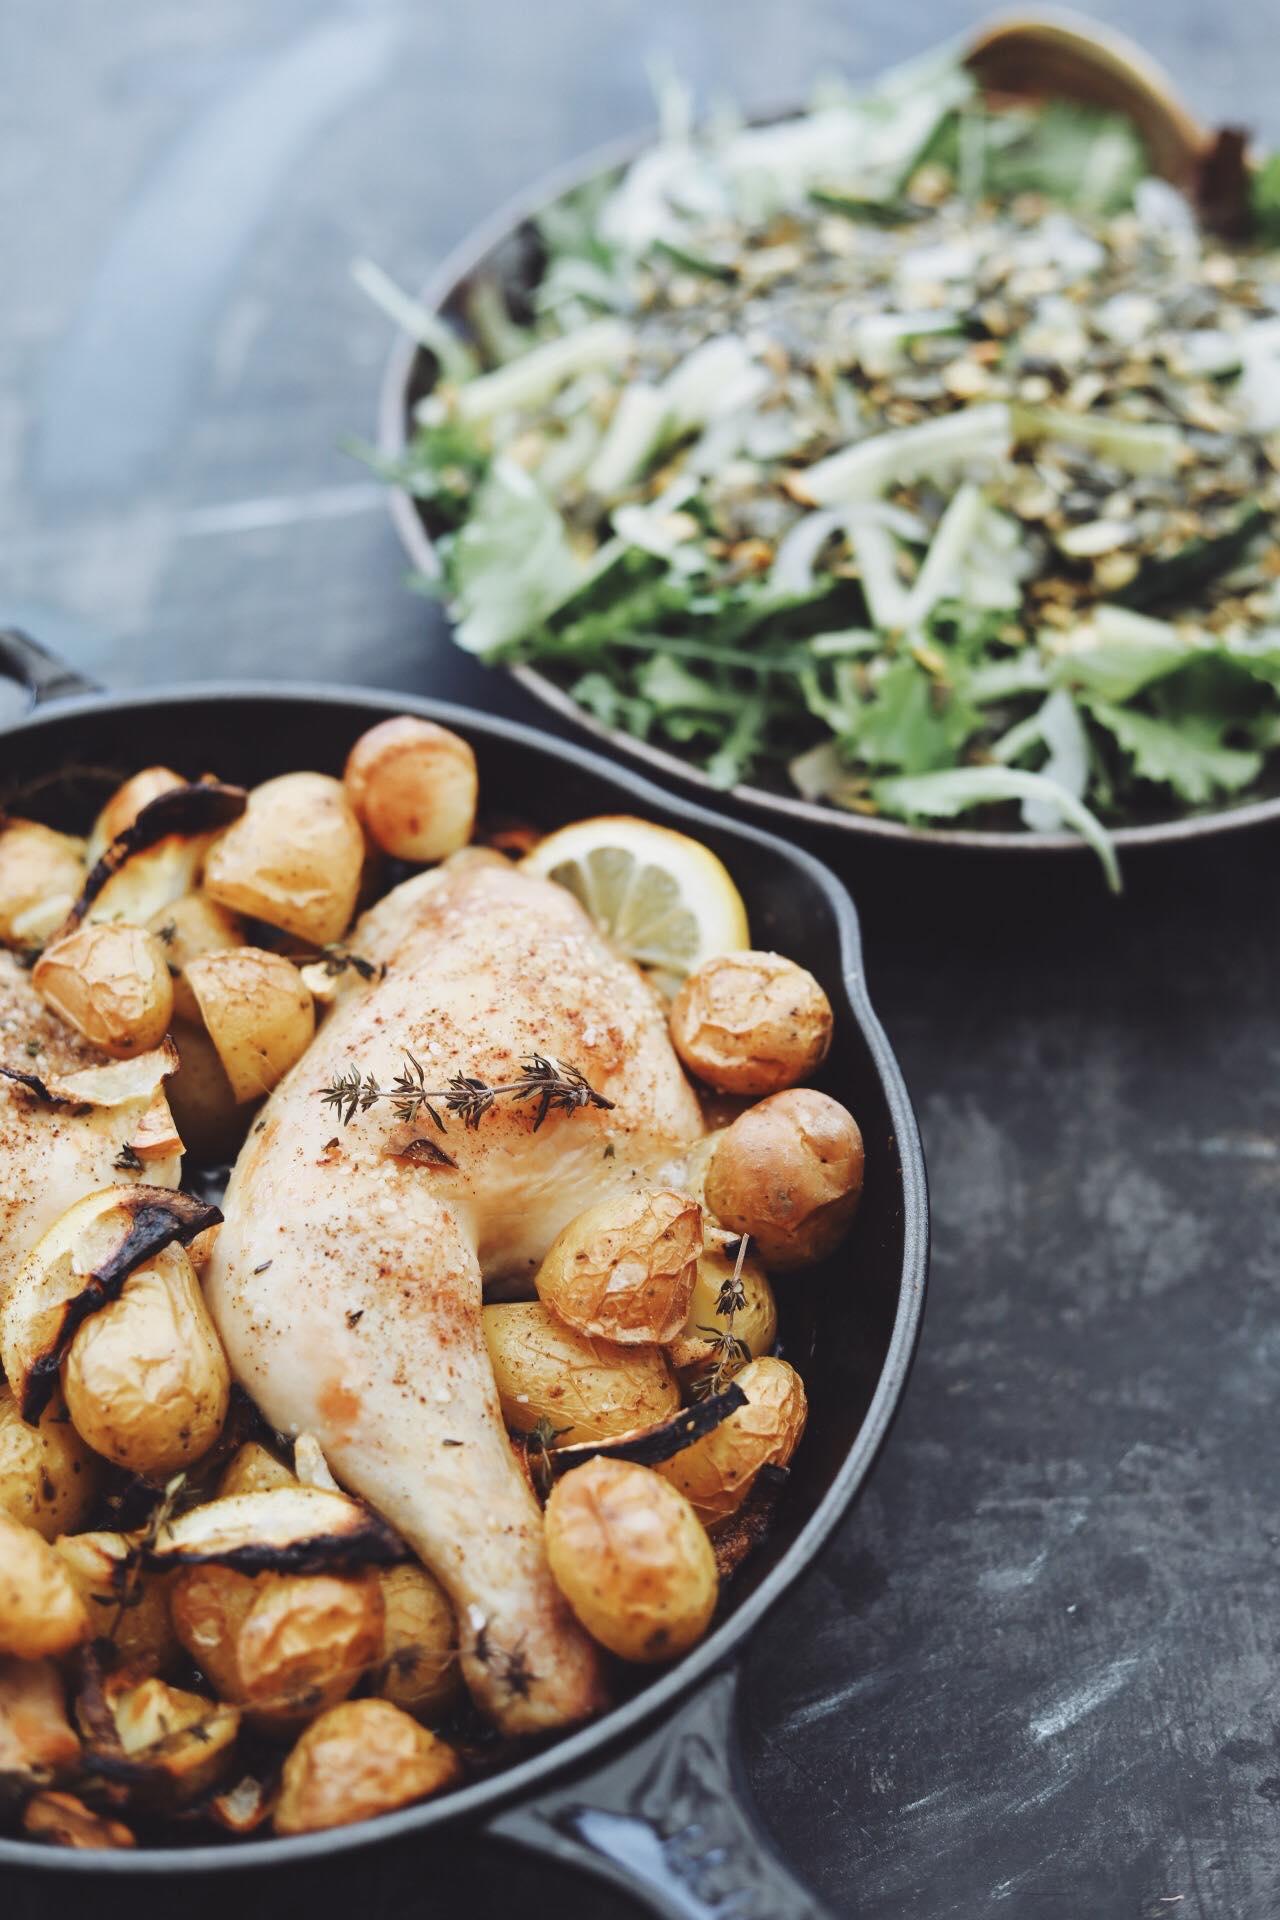 Ovnstegt kylling med kartofler og urter